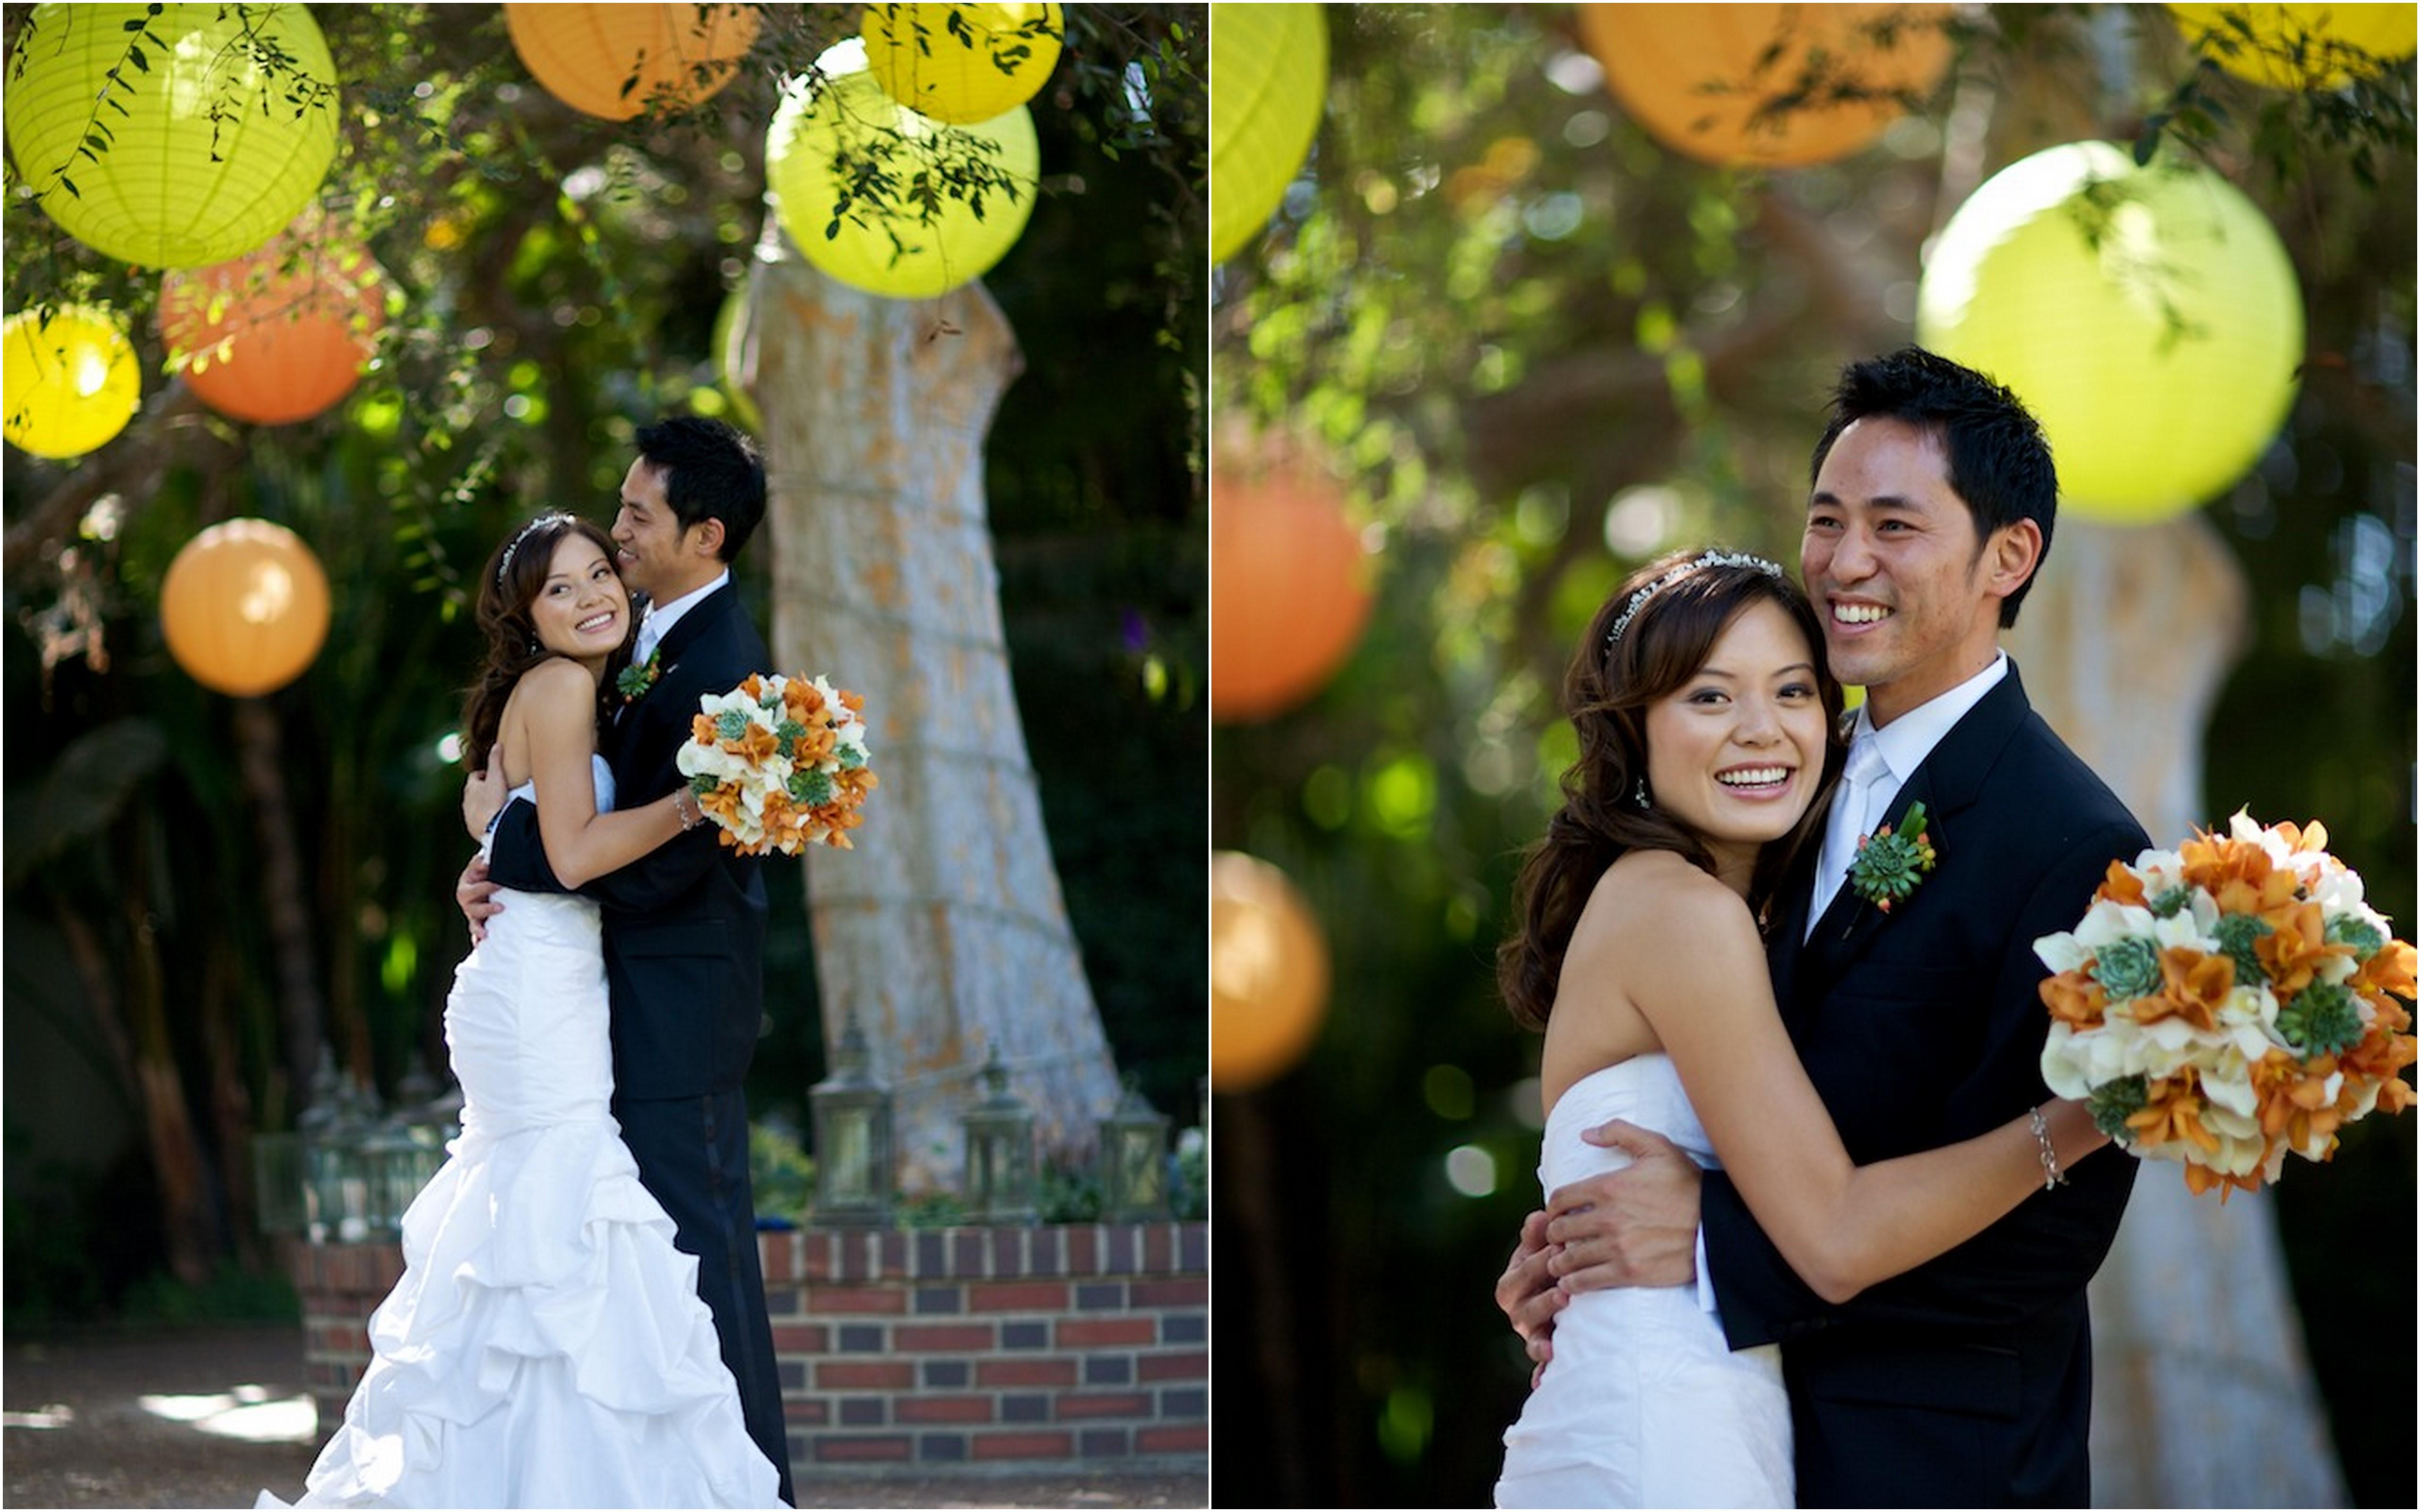 unique orange and yellow wedding decorations wedding